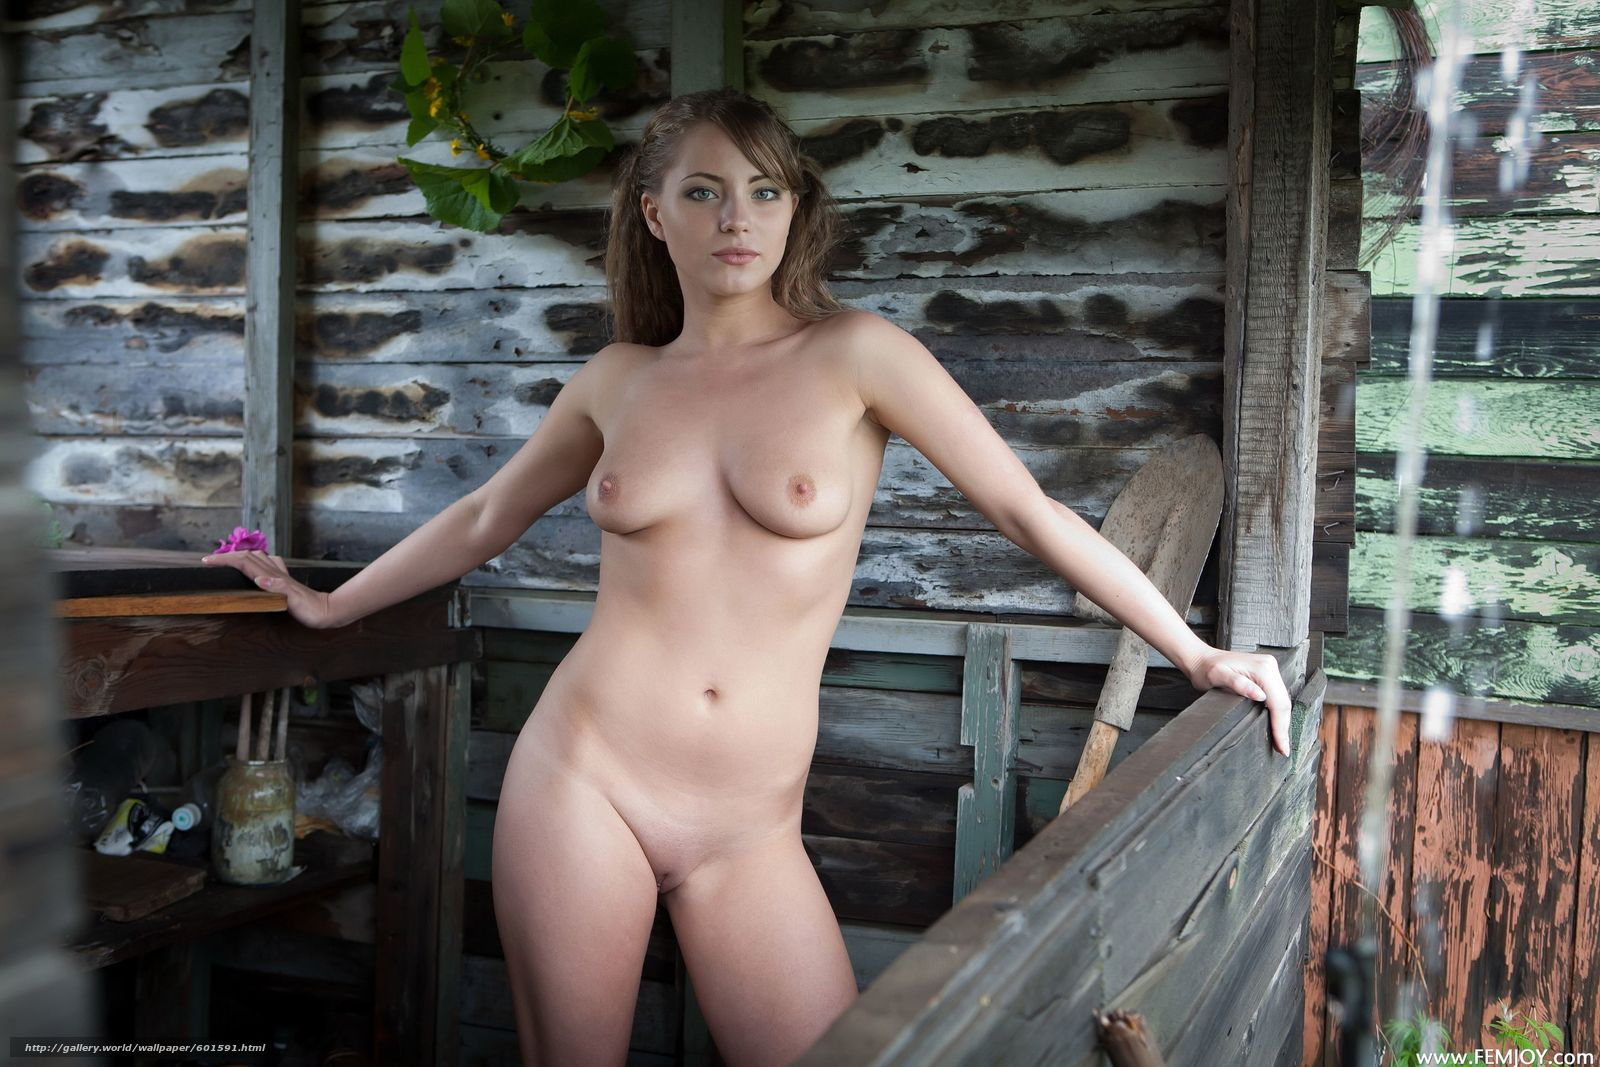 Эротическе фото девушек на даче 6 фотография